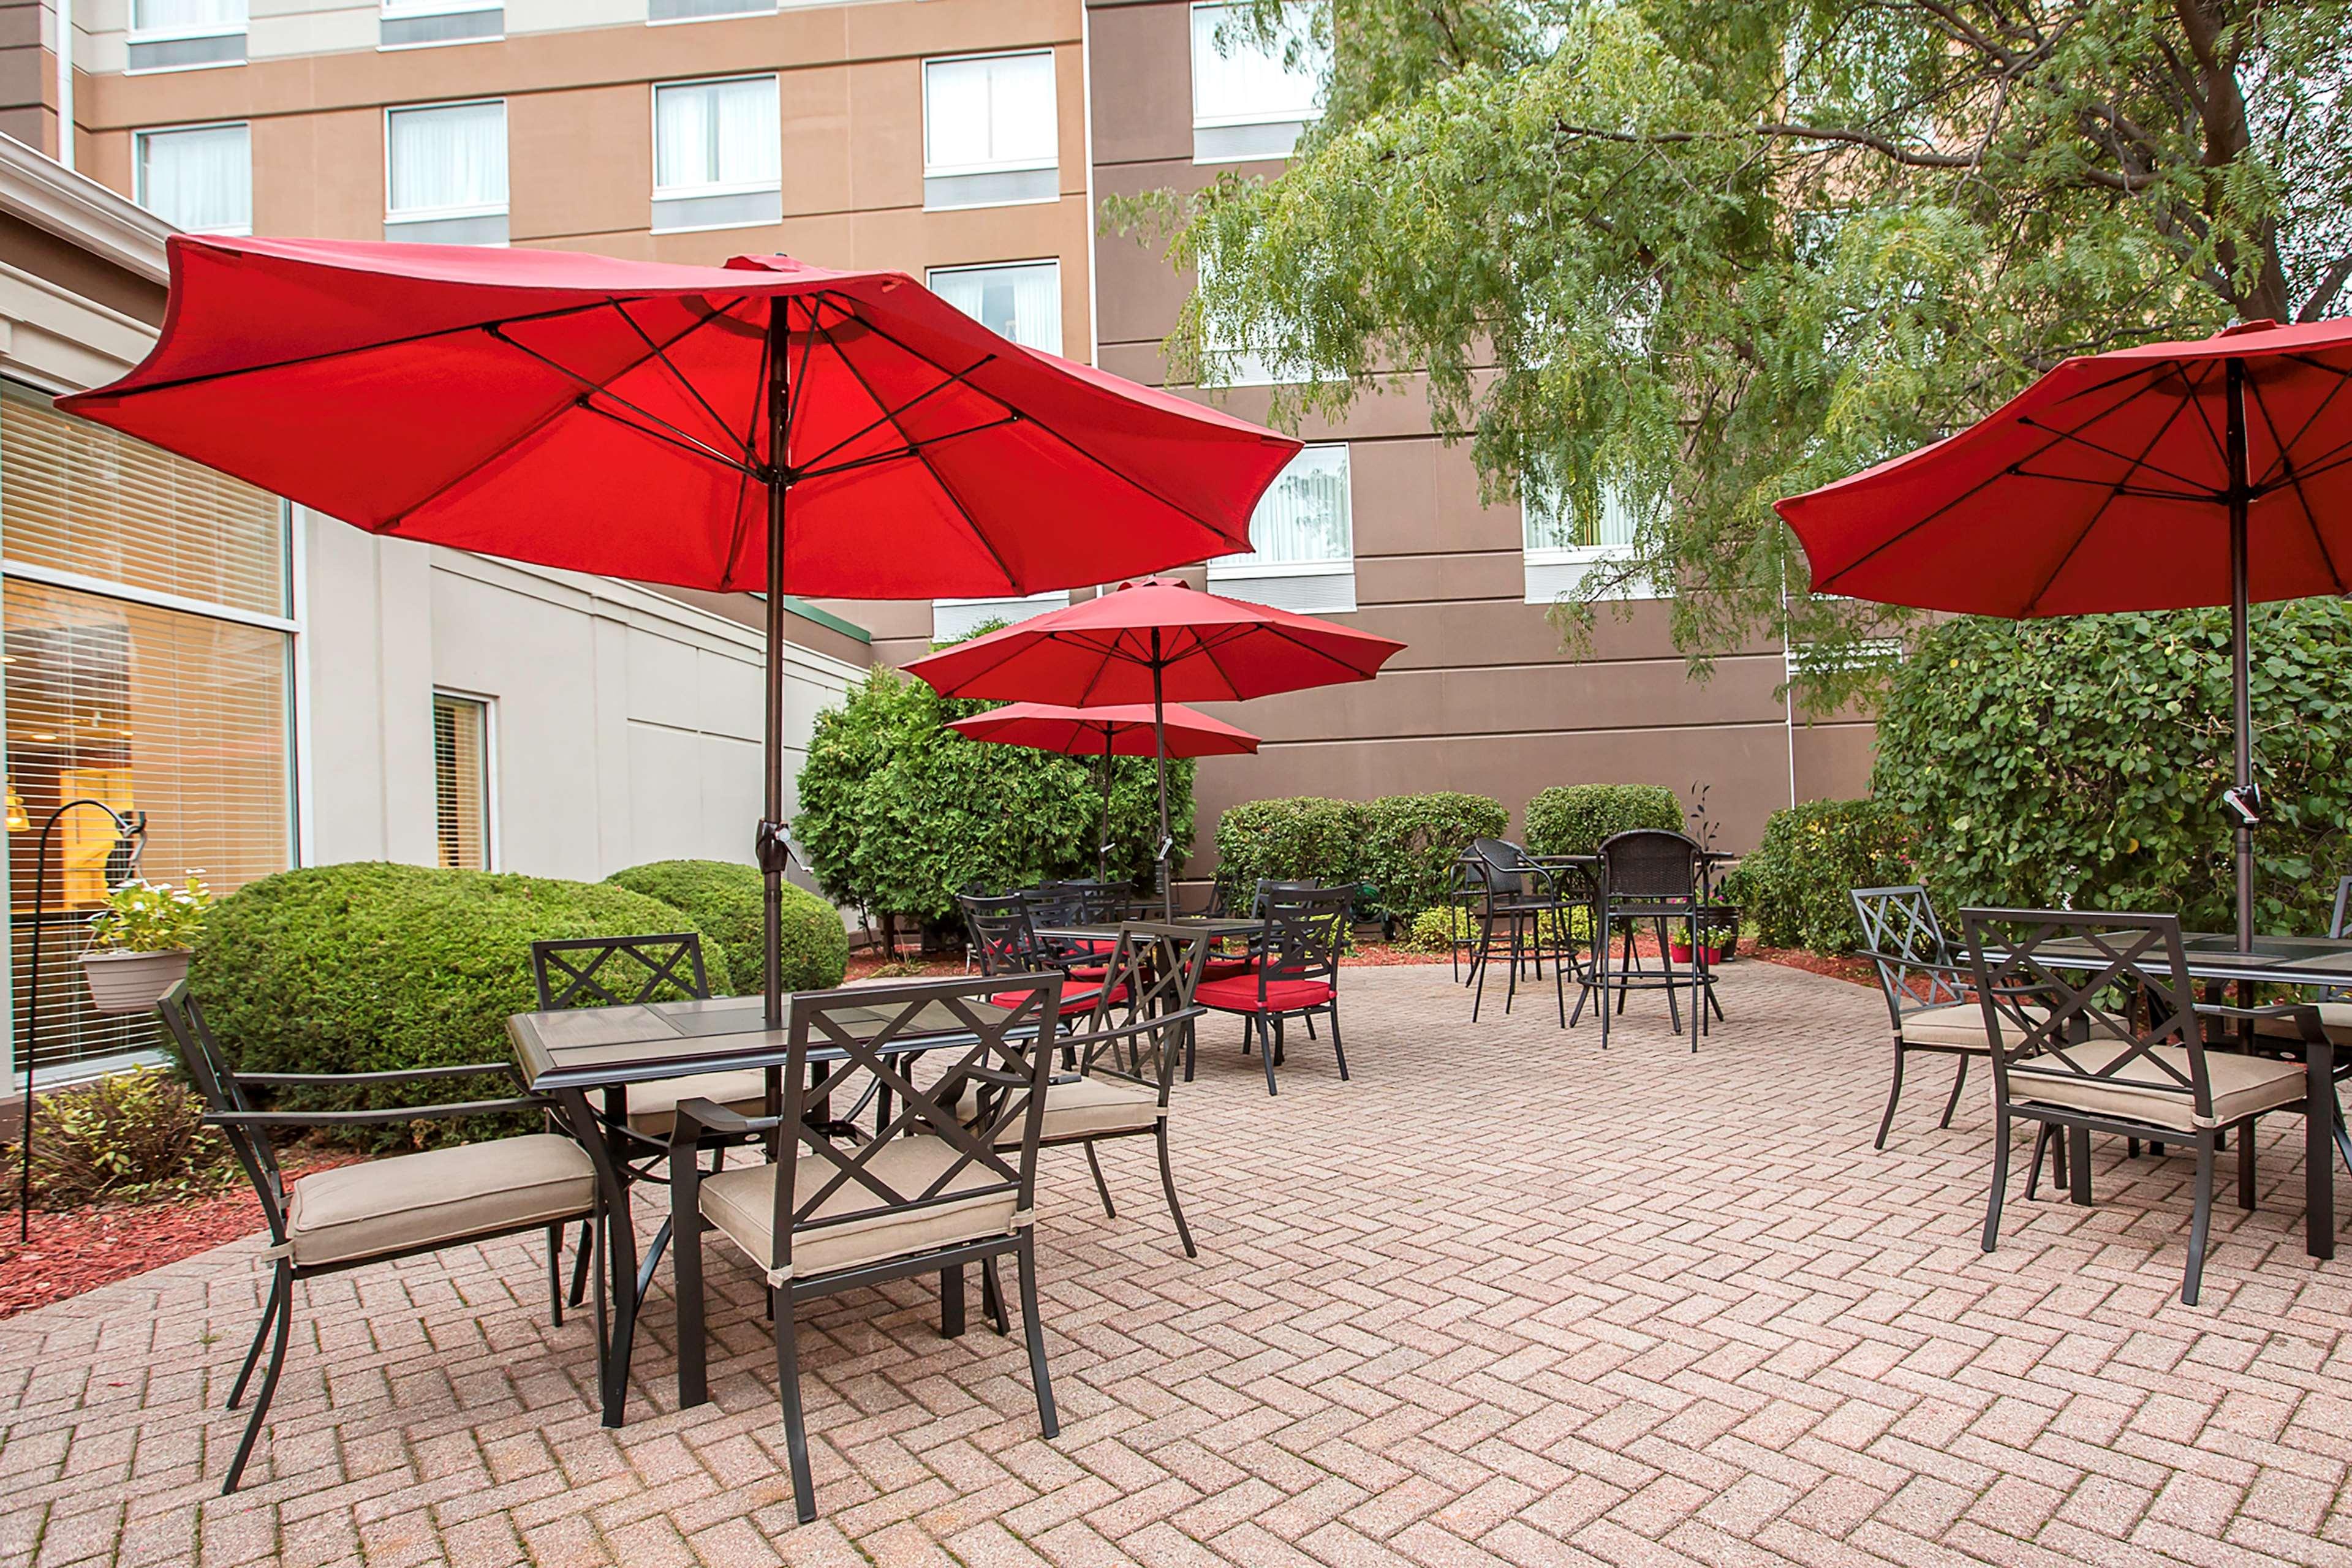 Hilton Garden Inn Appleton/Kimberly image 3